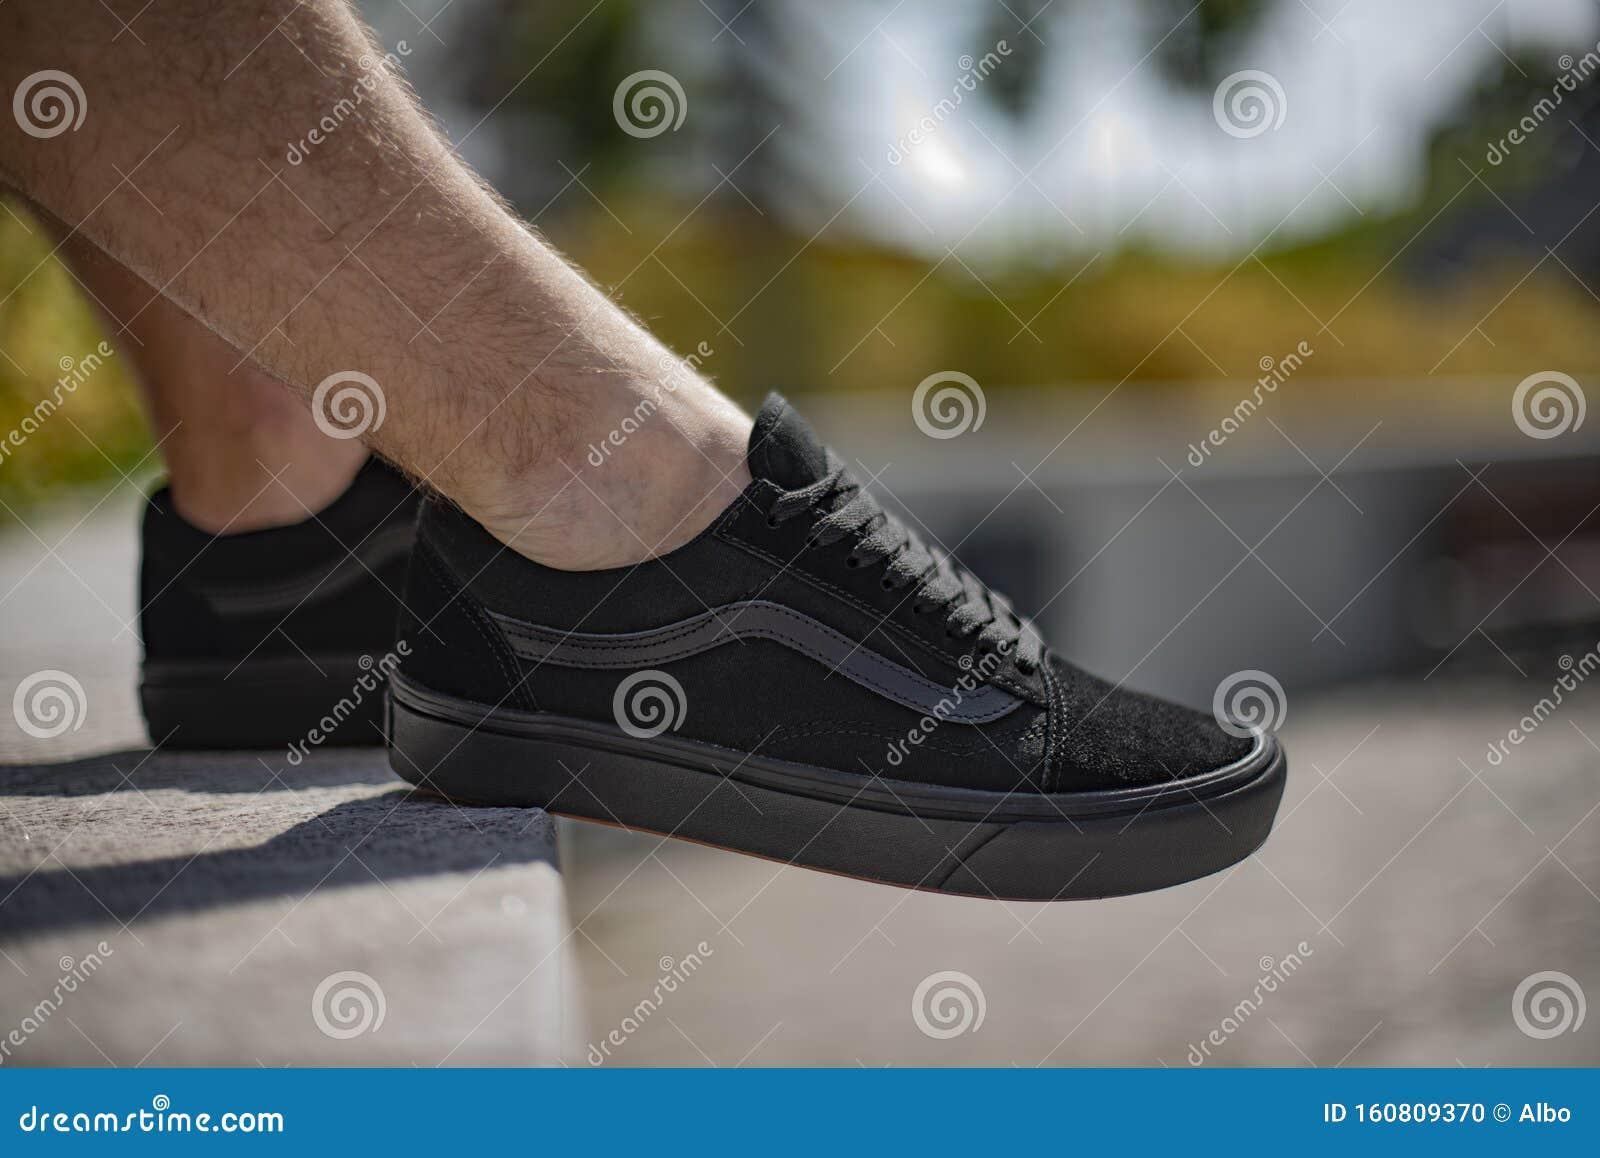 Tortuga Pertenecer a zapatilla  Black Vans vieja escuela imagen editorial. Imagen de vieja - 160809370